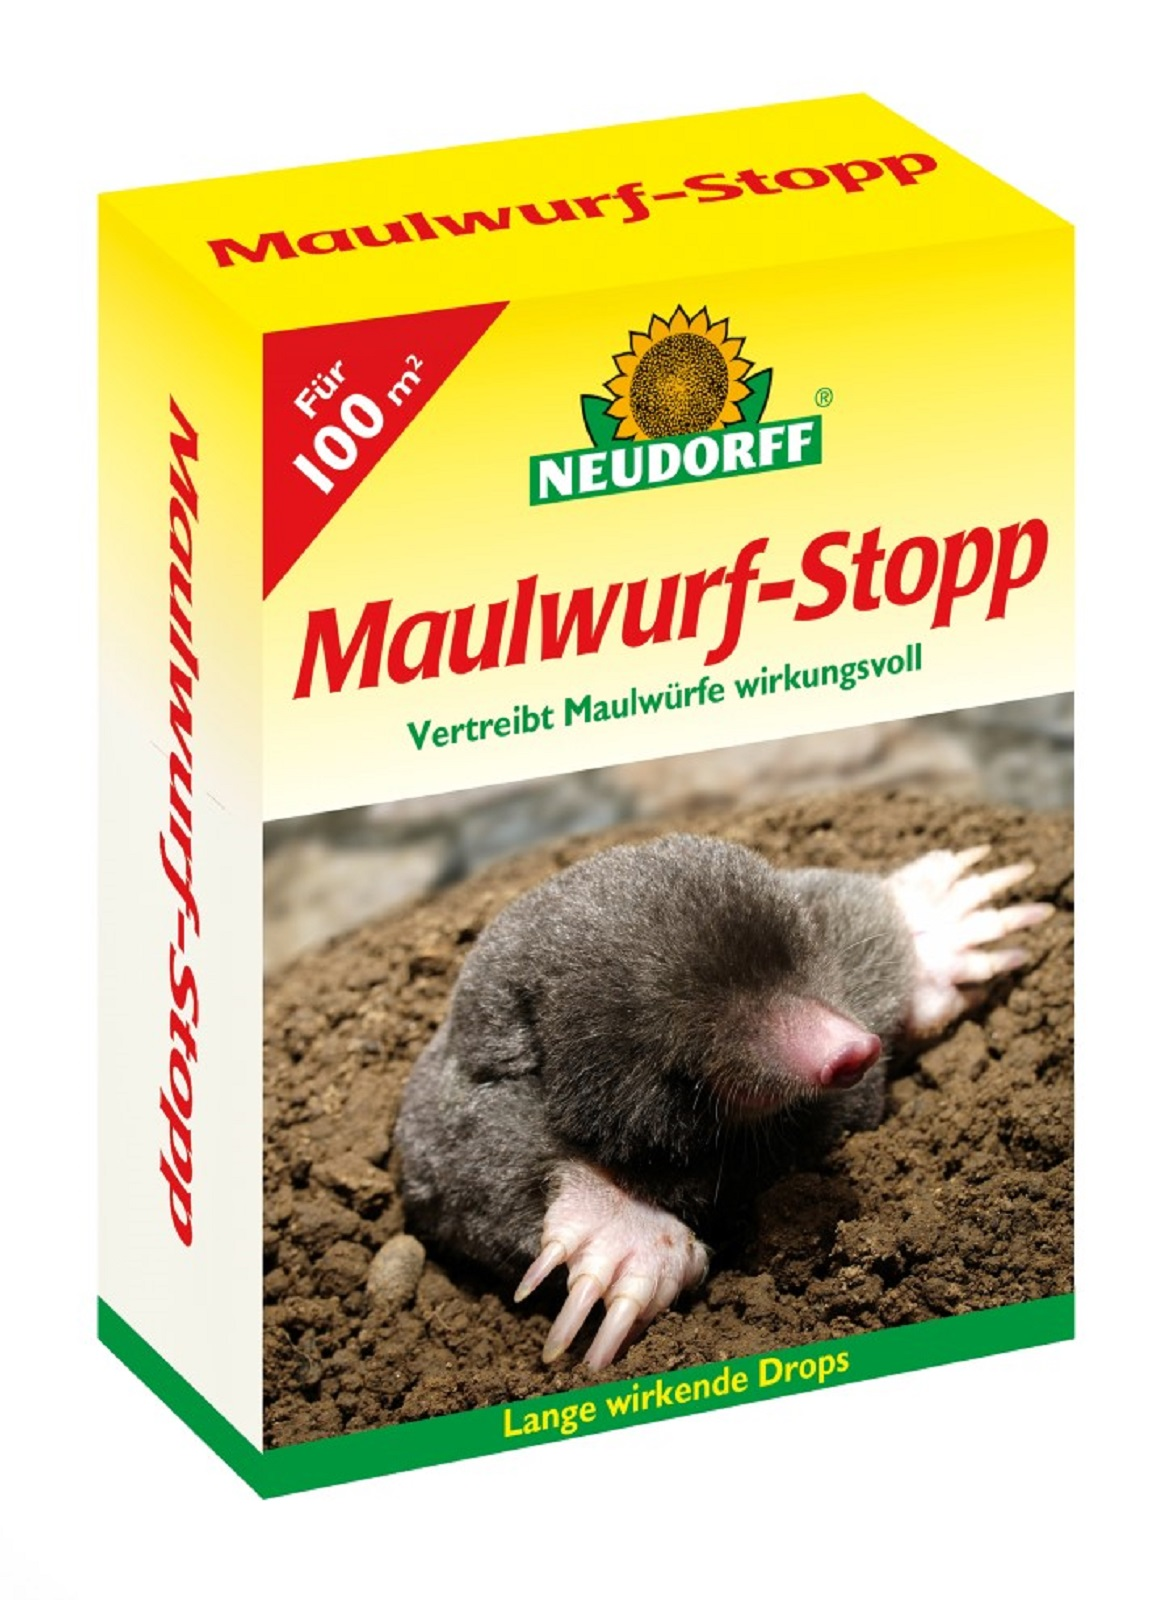 Neudorff Maulwurf Stopp 200 g Umweltschonend